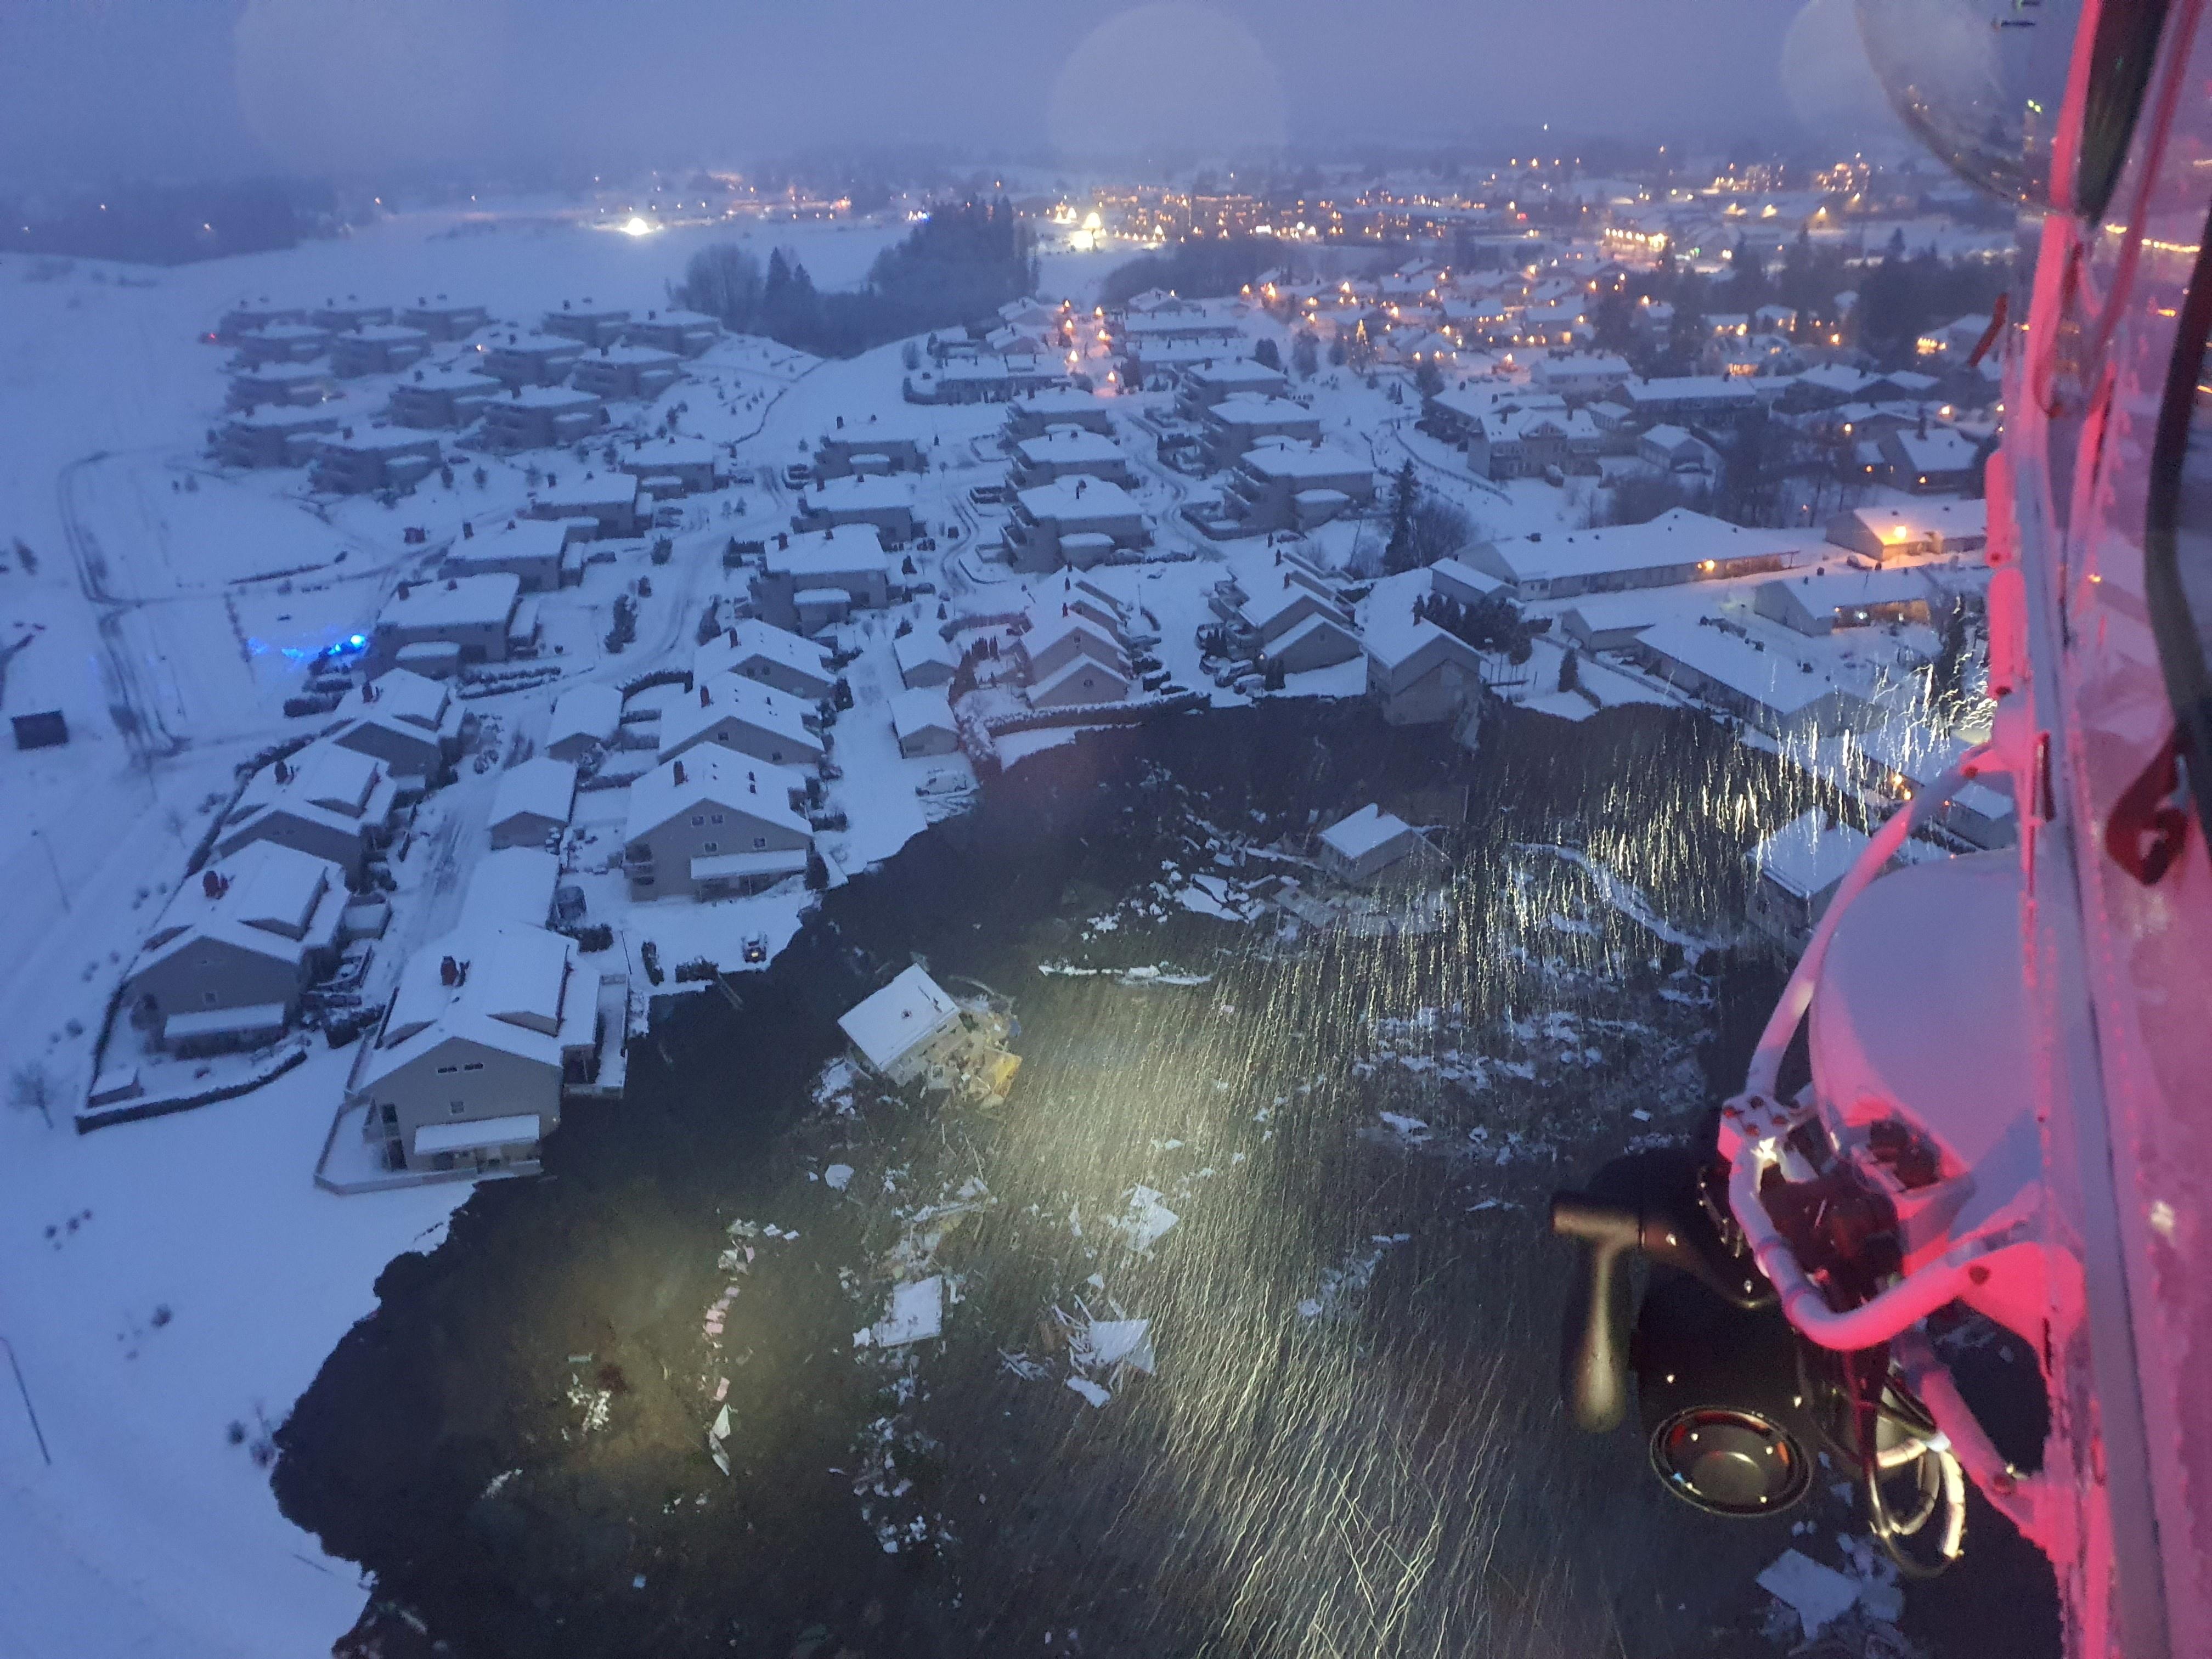 Search continues for survivors after major Norway landslide